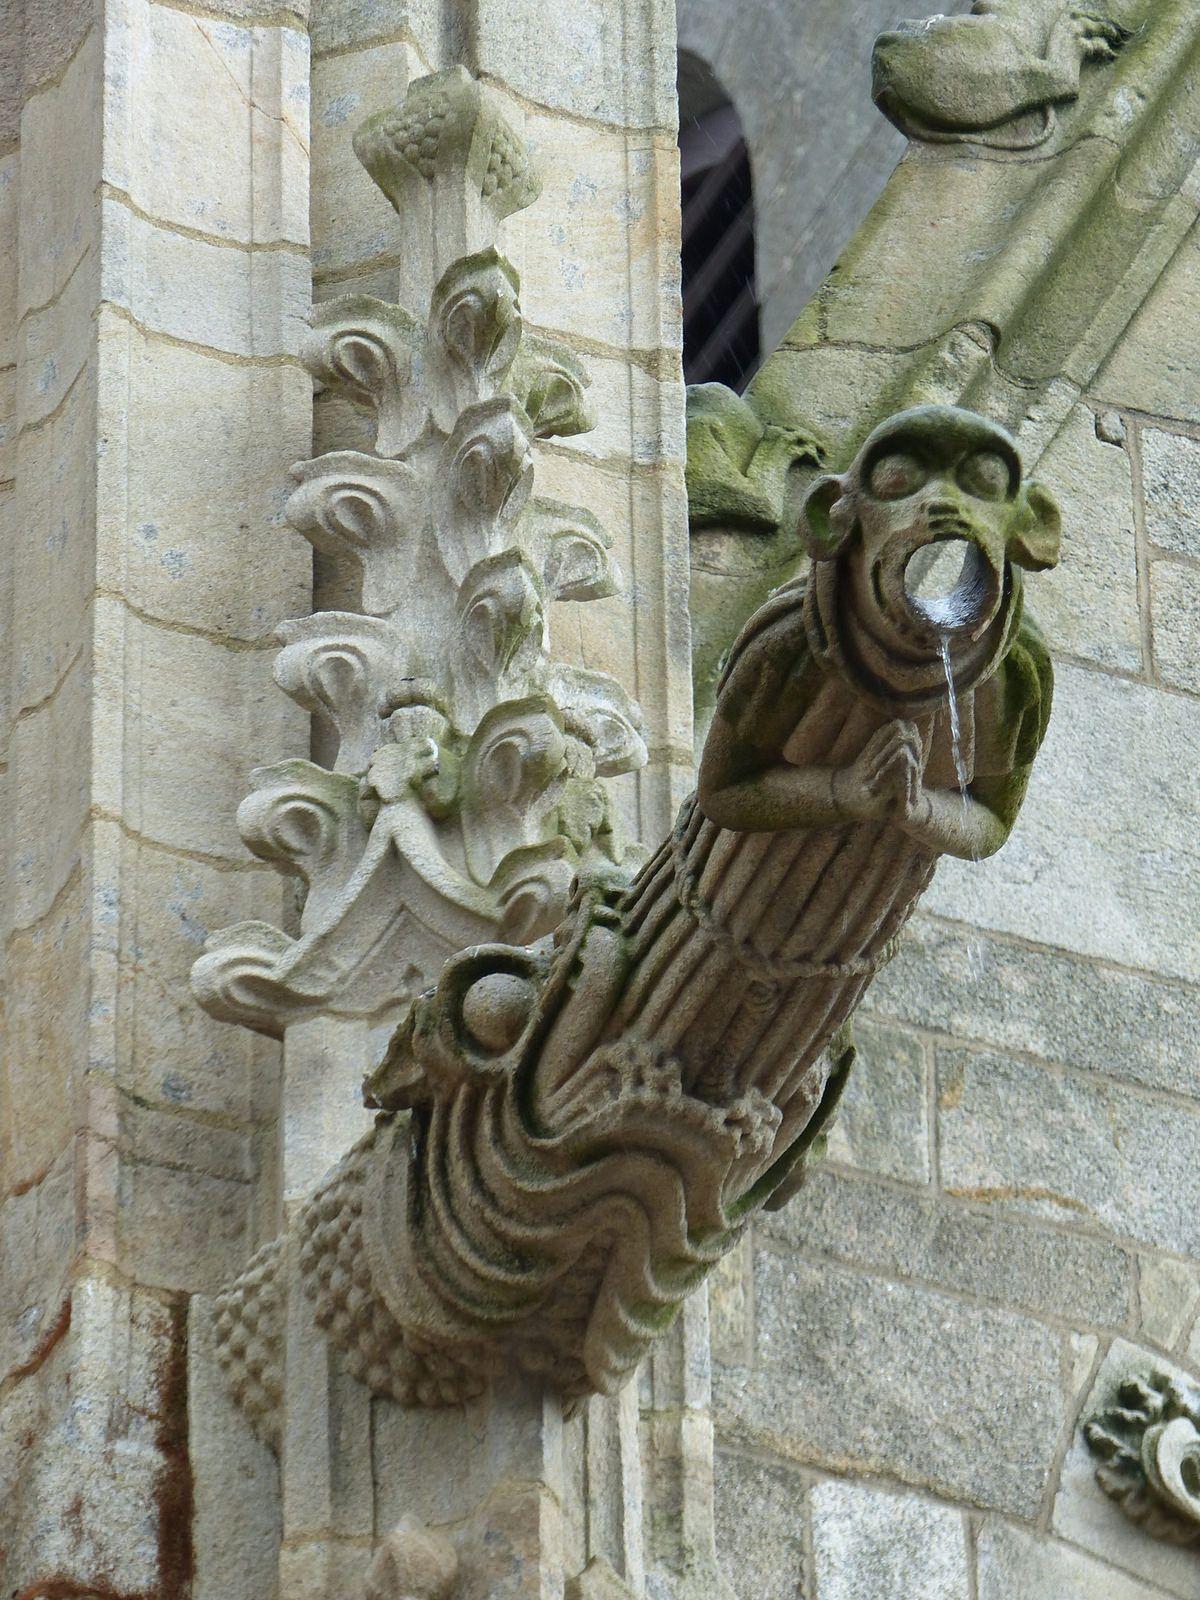 20150822 Morbihan Ploërmel - Eglise Saint Armel AH  (18) | by anhndee